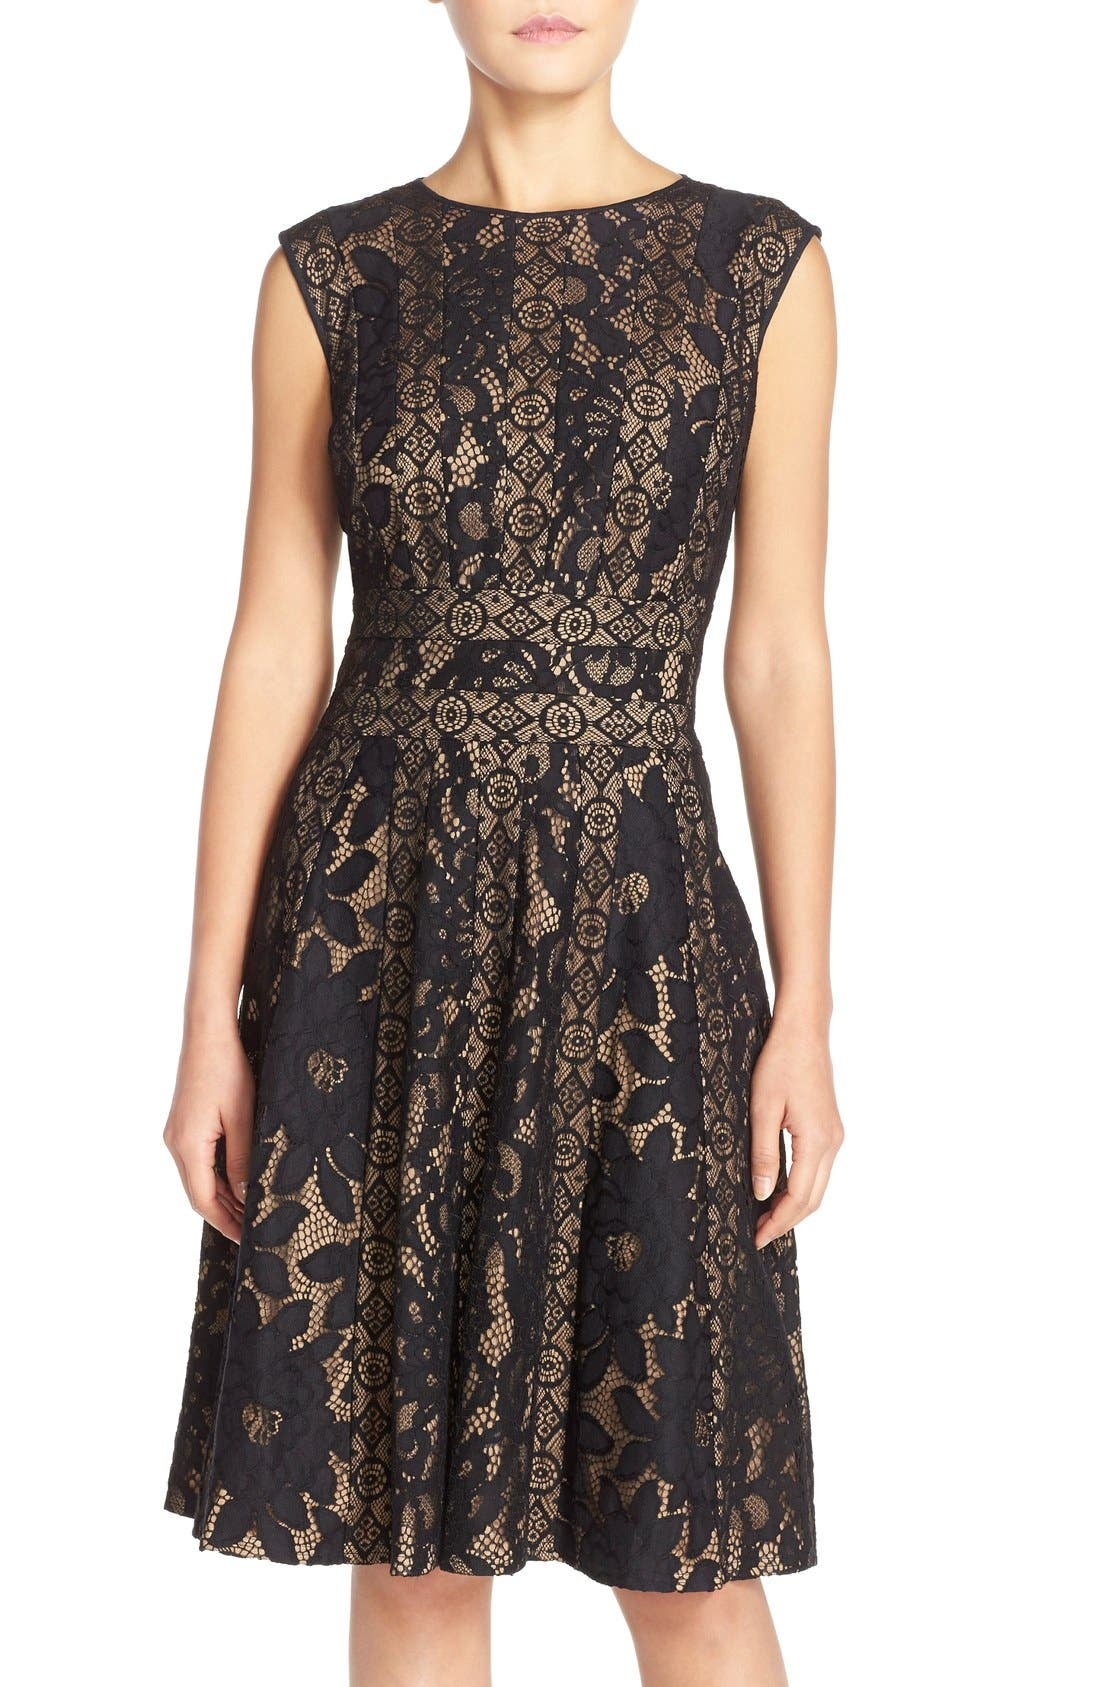 Main Image - Tadashi Shoji Mixed Lace Fit & Flare Dress